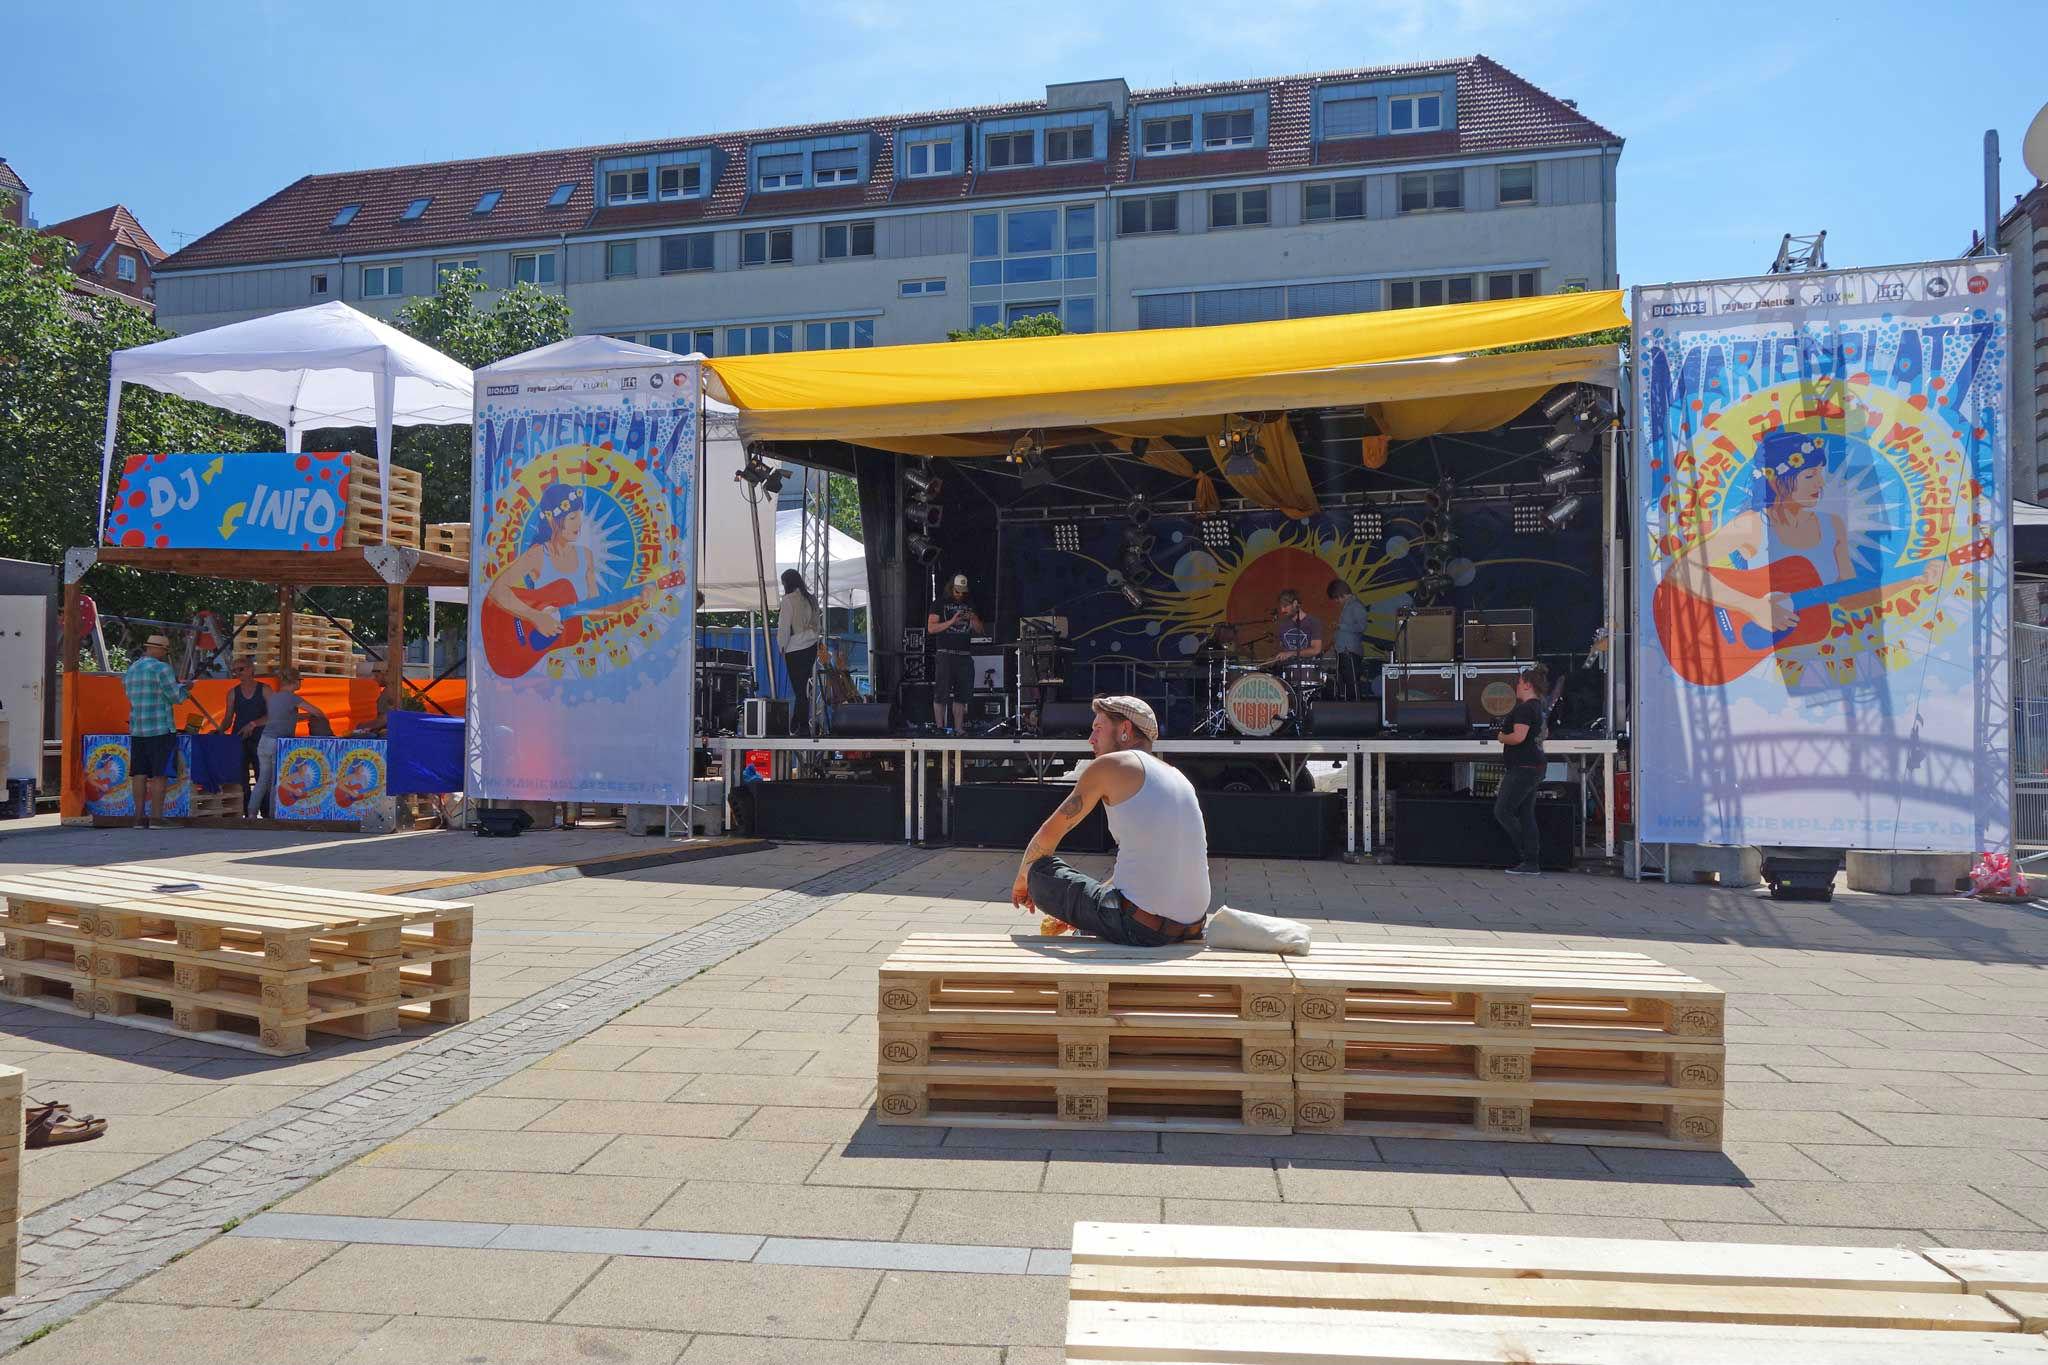 Kleon Medugorac Marienplatz Fest 2014